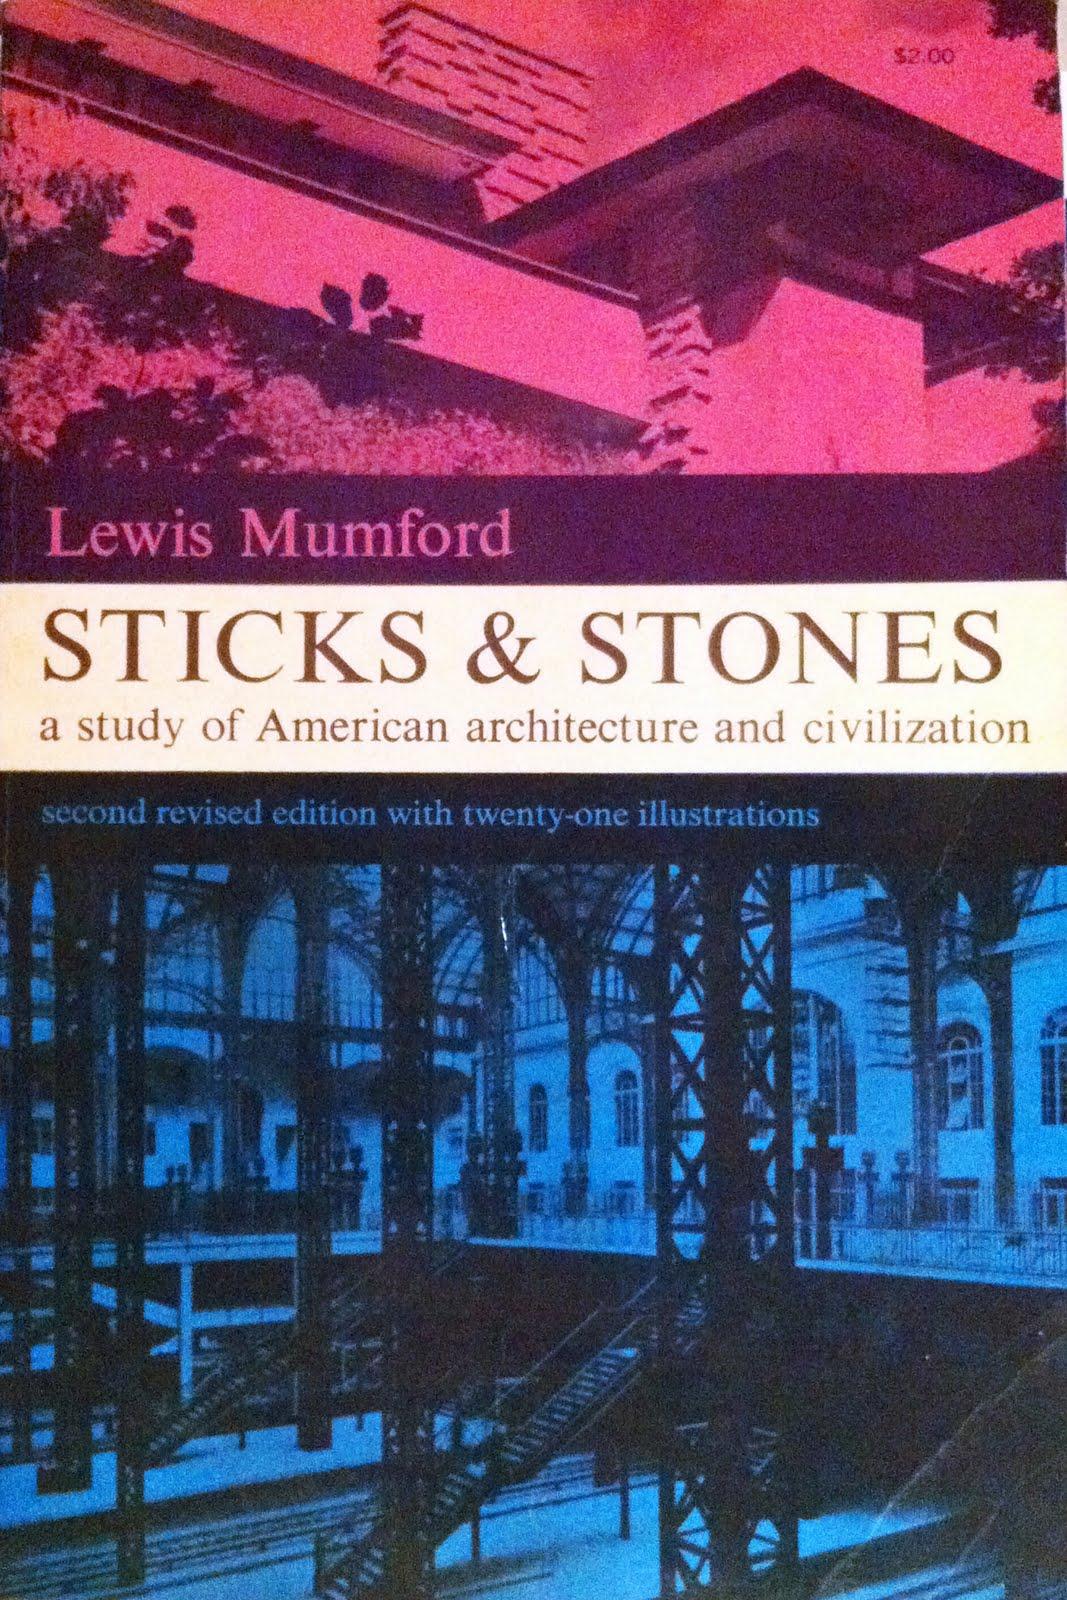 Lewis Mumford's quote #1